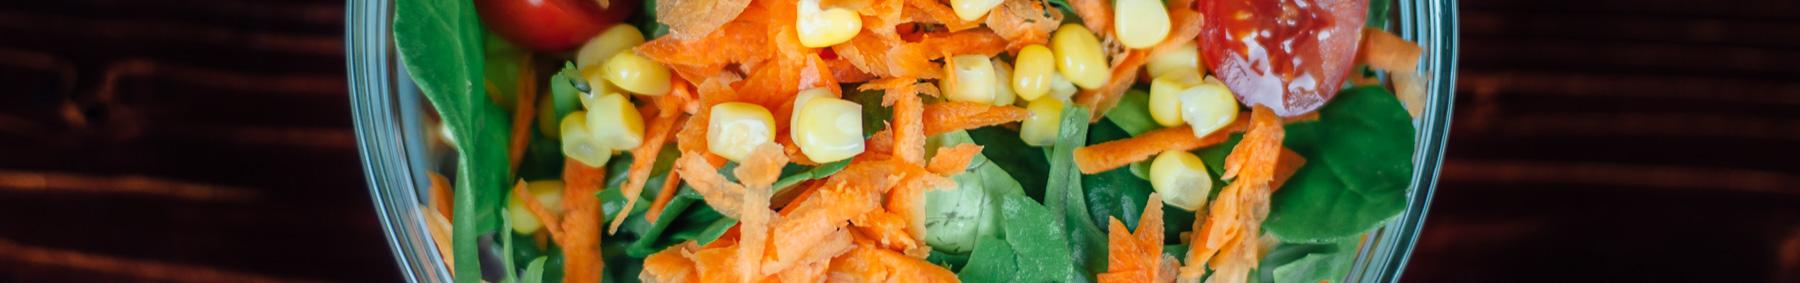 Groente en fruitsalades